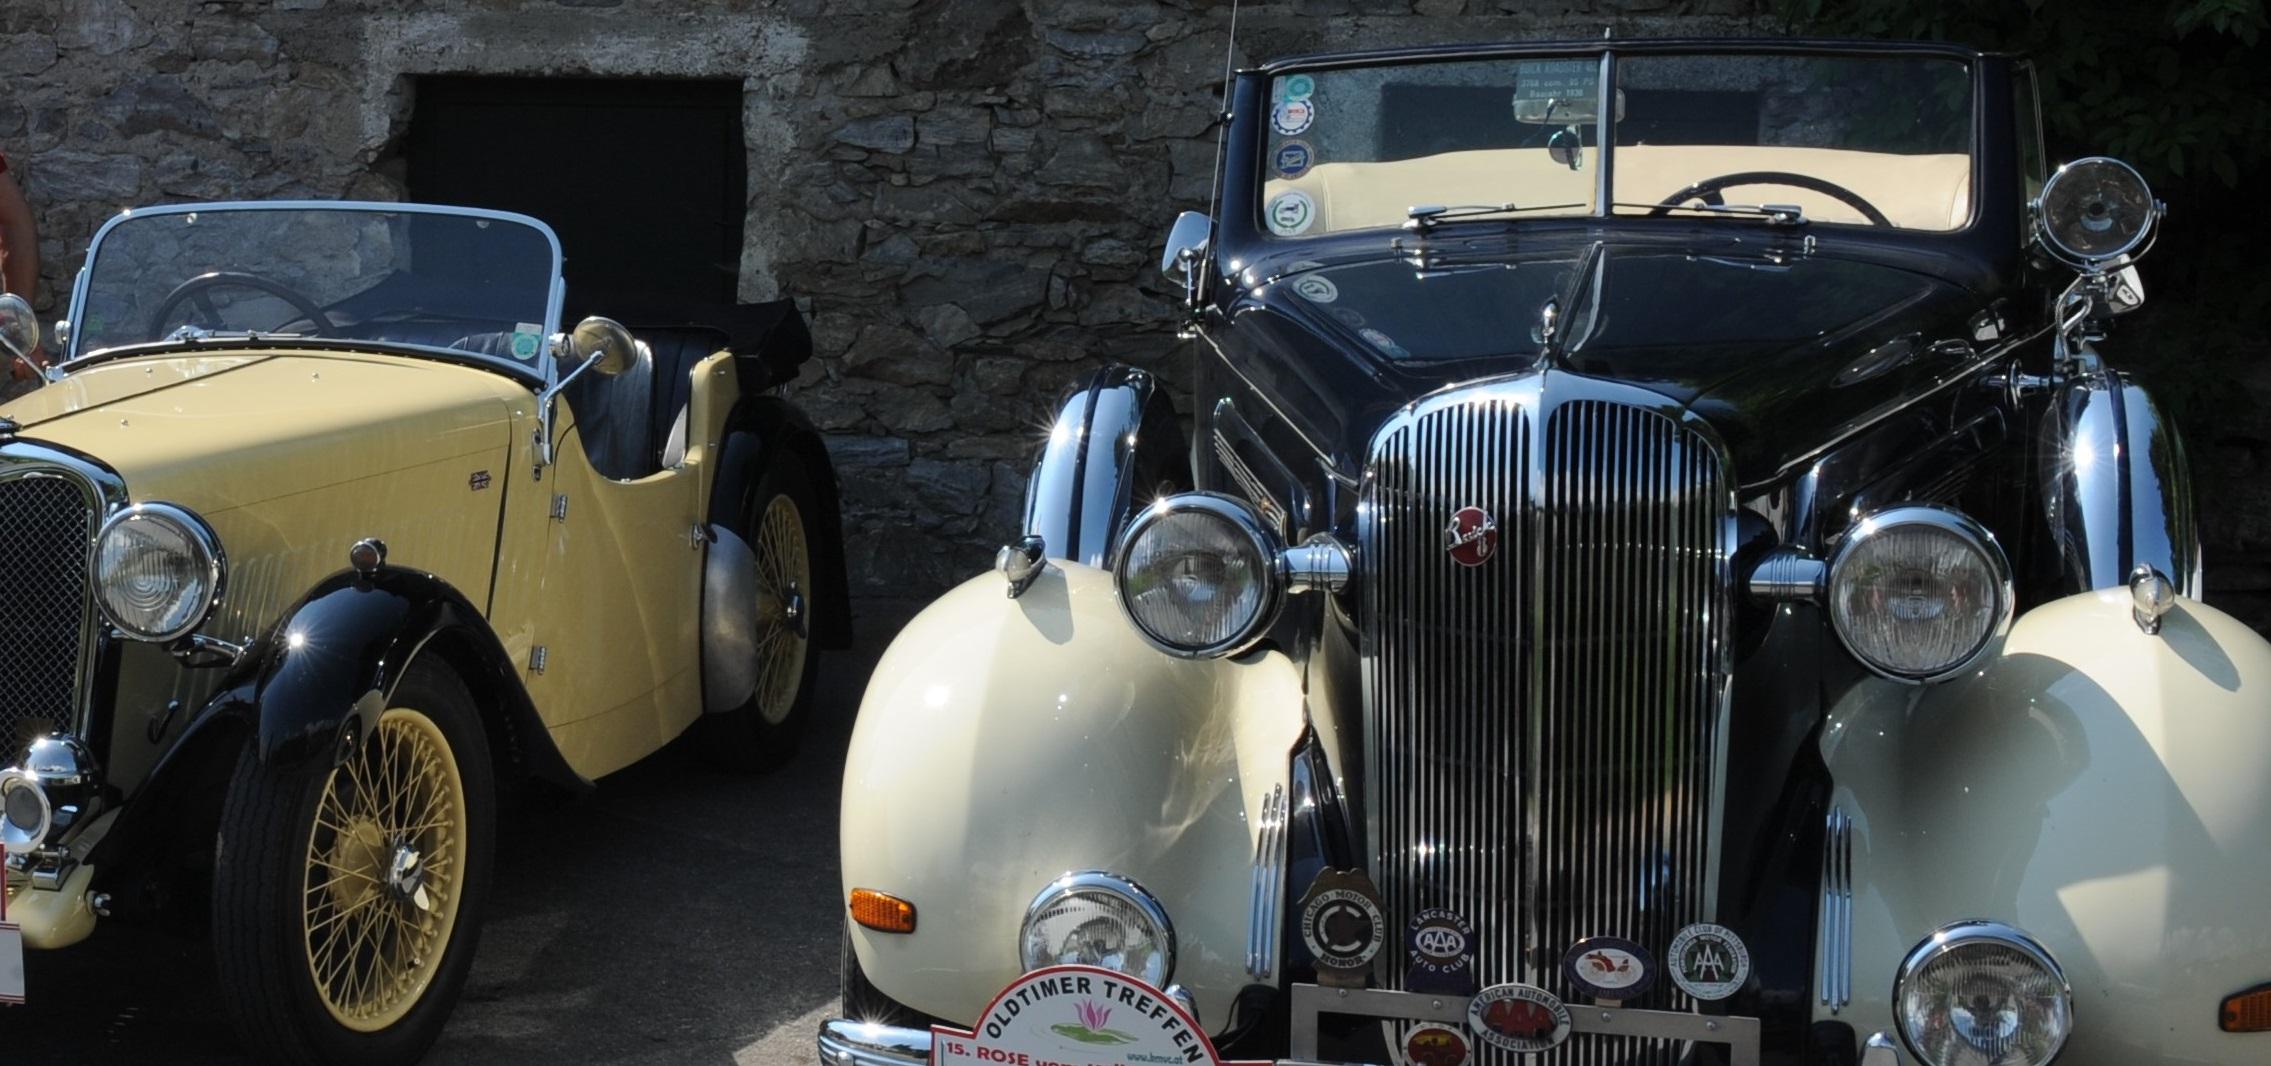 KMVC Kultur- Erlebnisreise<br>SIZILIEN – KALABRIEN<br>geplant vom 20. – 30. Mai 2022